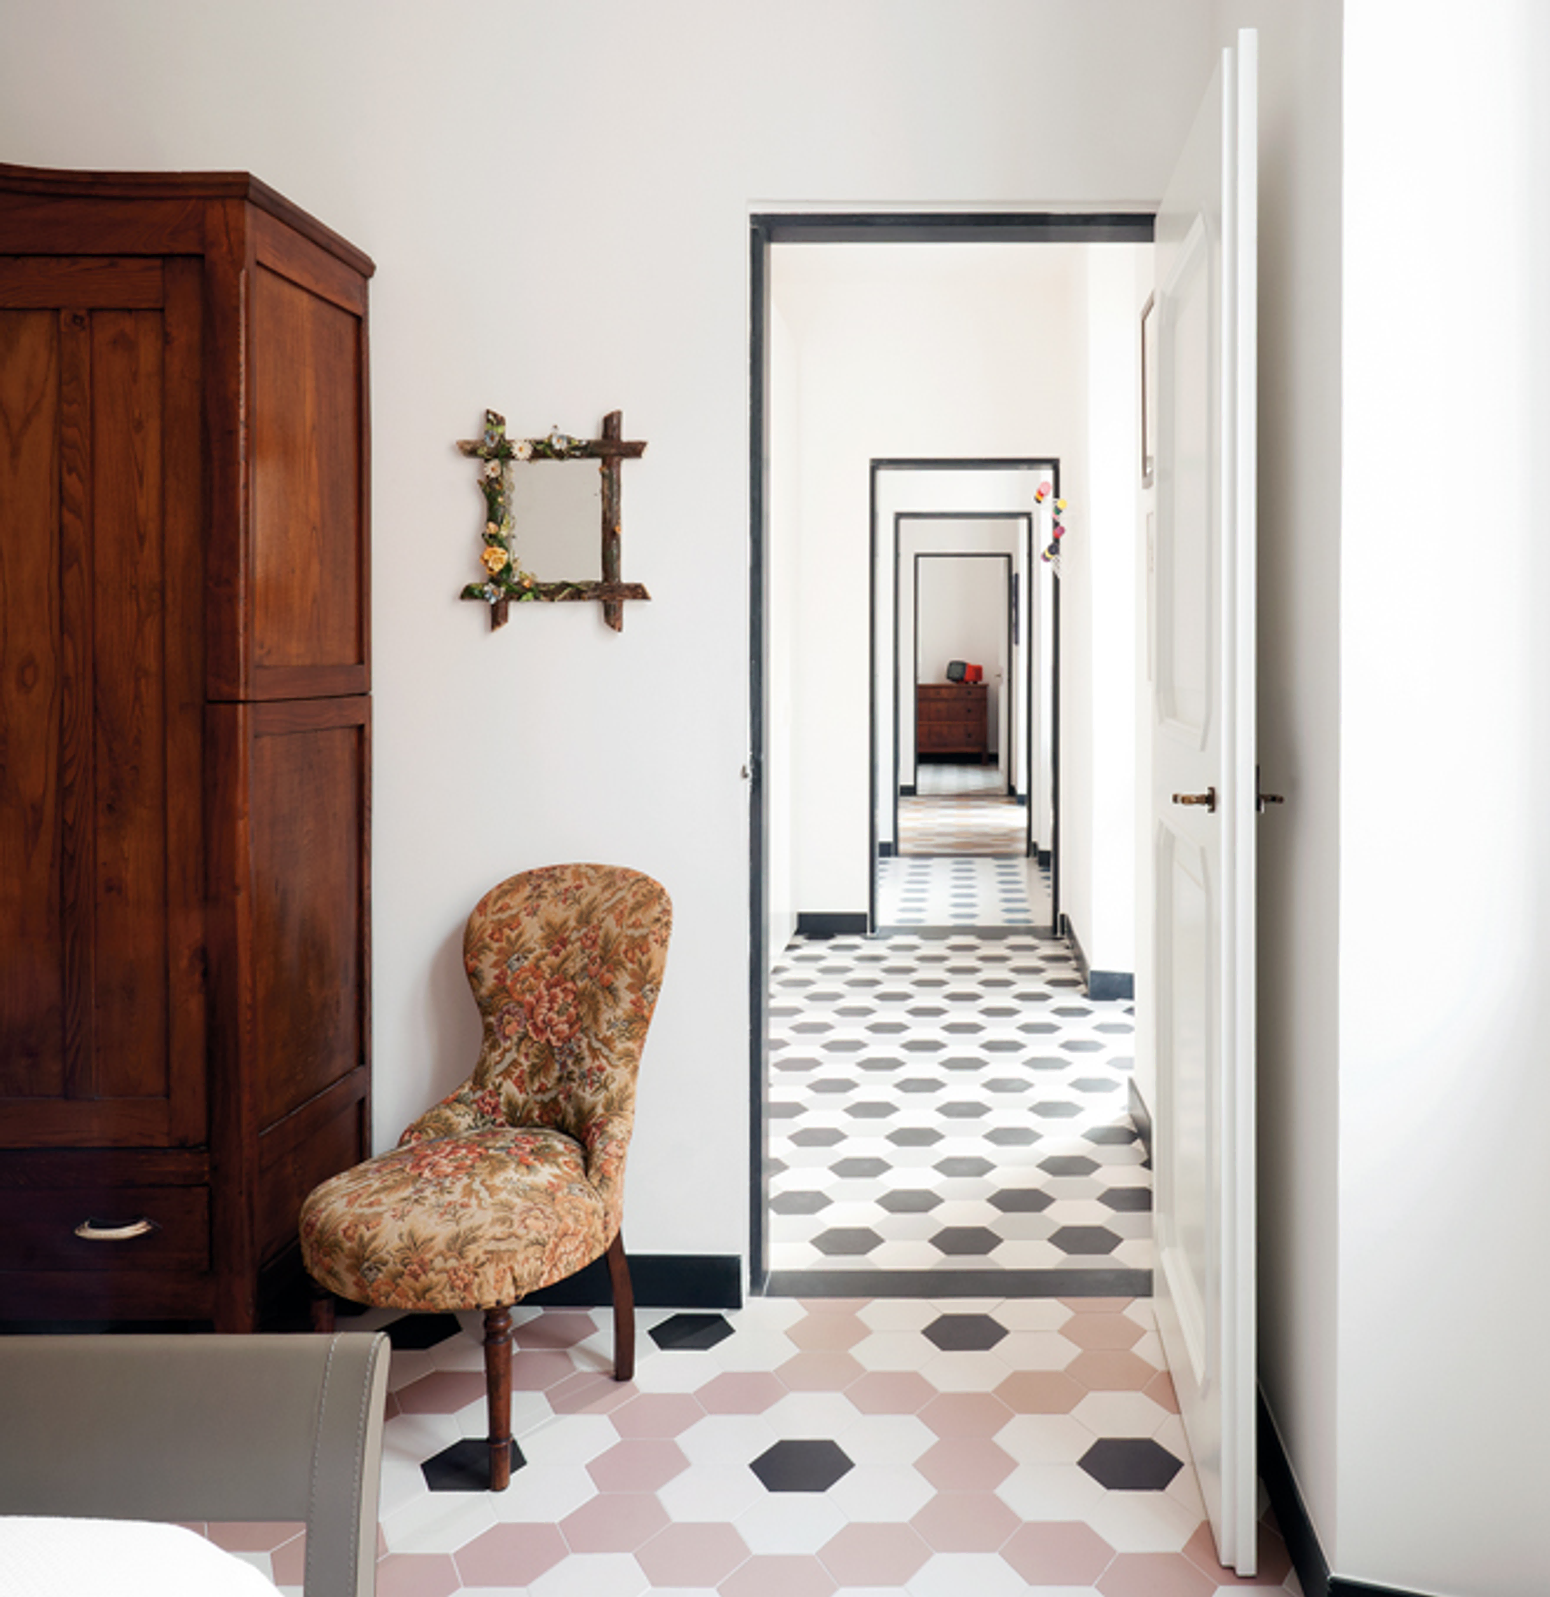 quarto piso revestimento hexagonal colorido